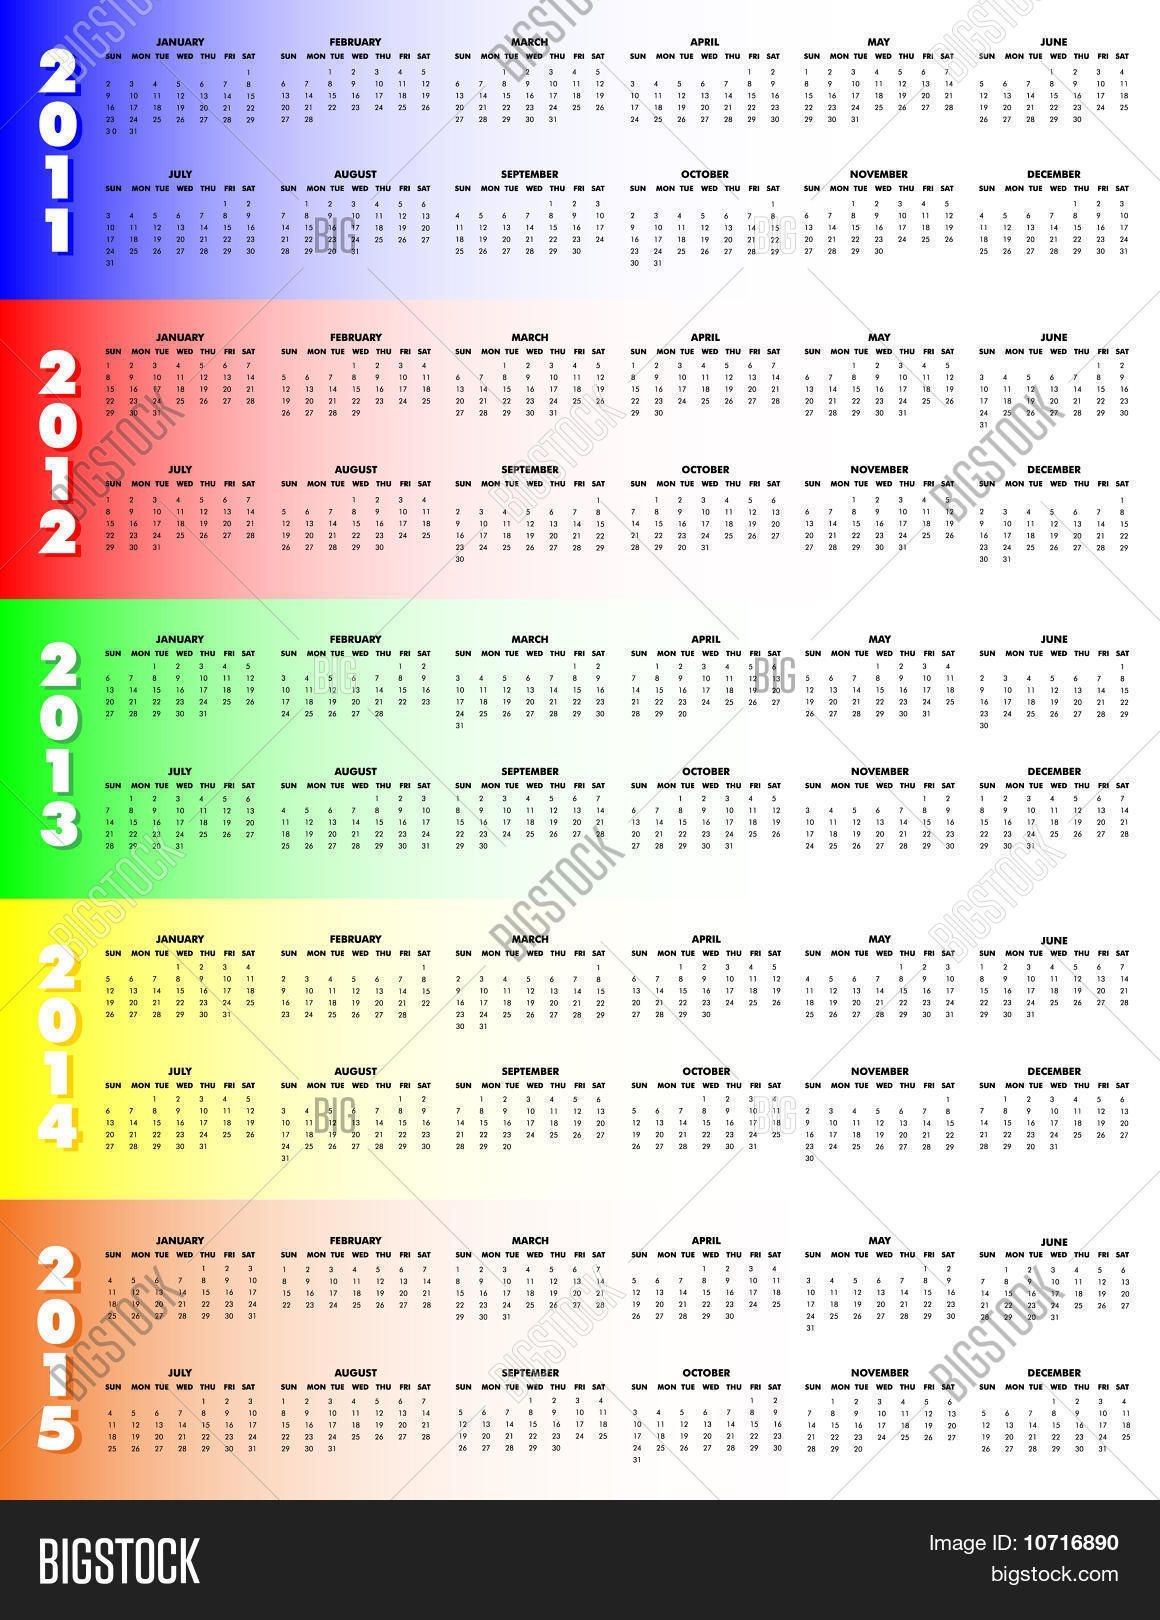 Five-Year Calendar Vector & Photo (Free Trial)   Bigstock